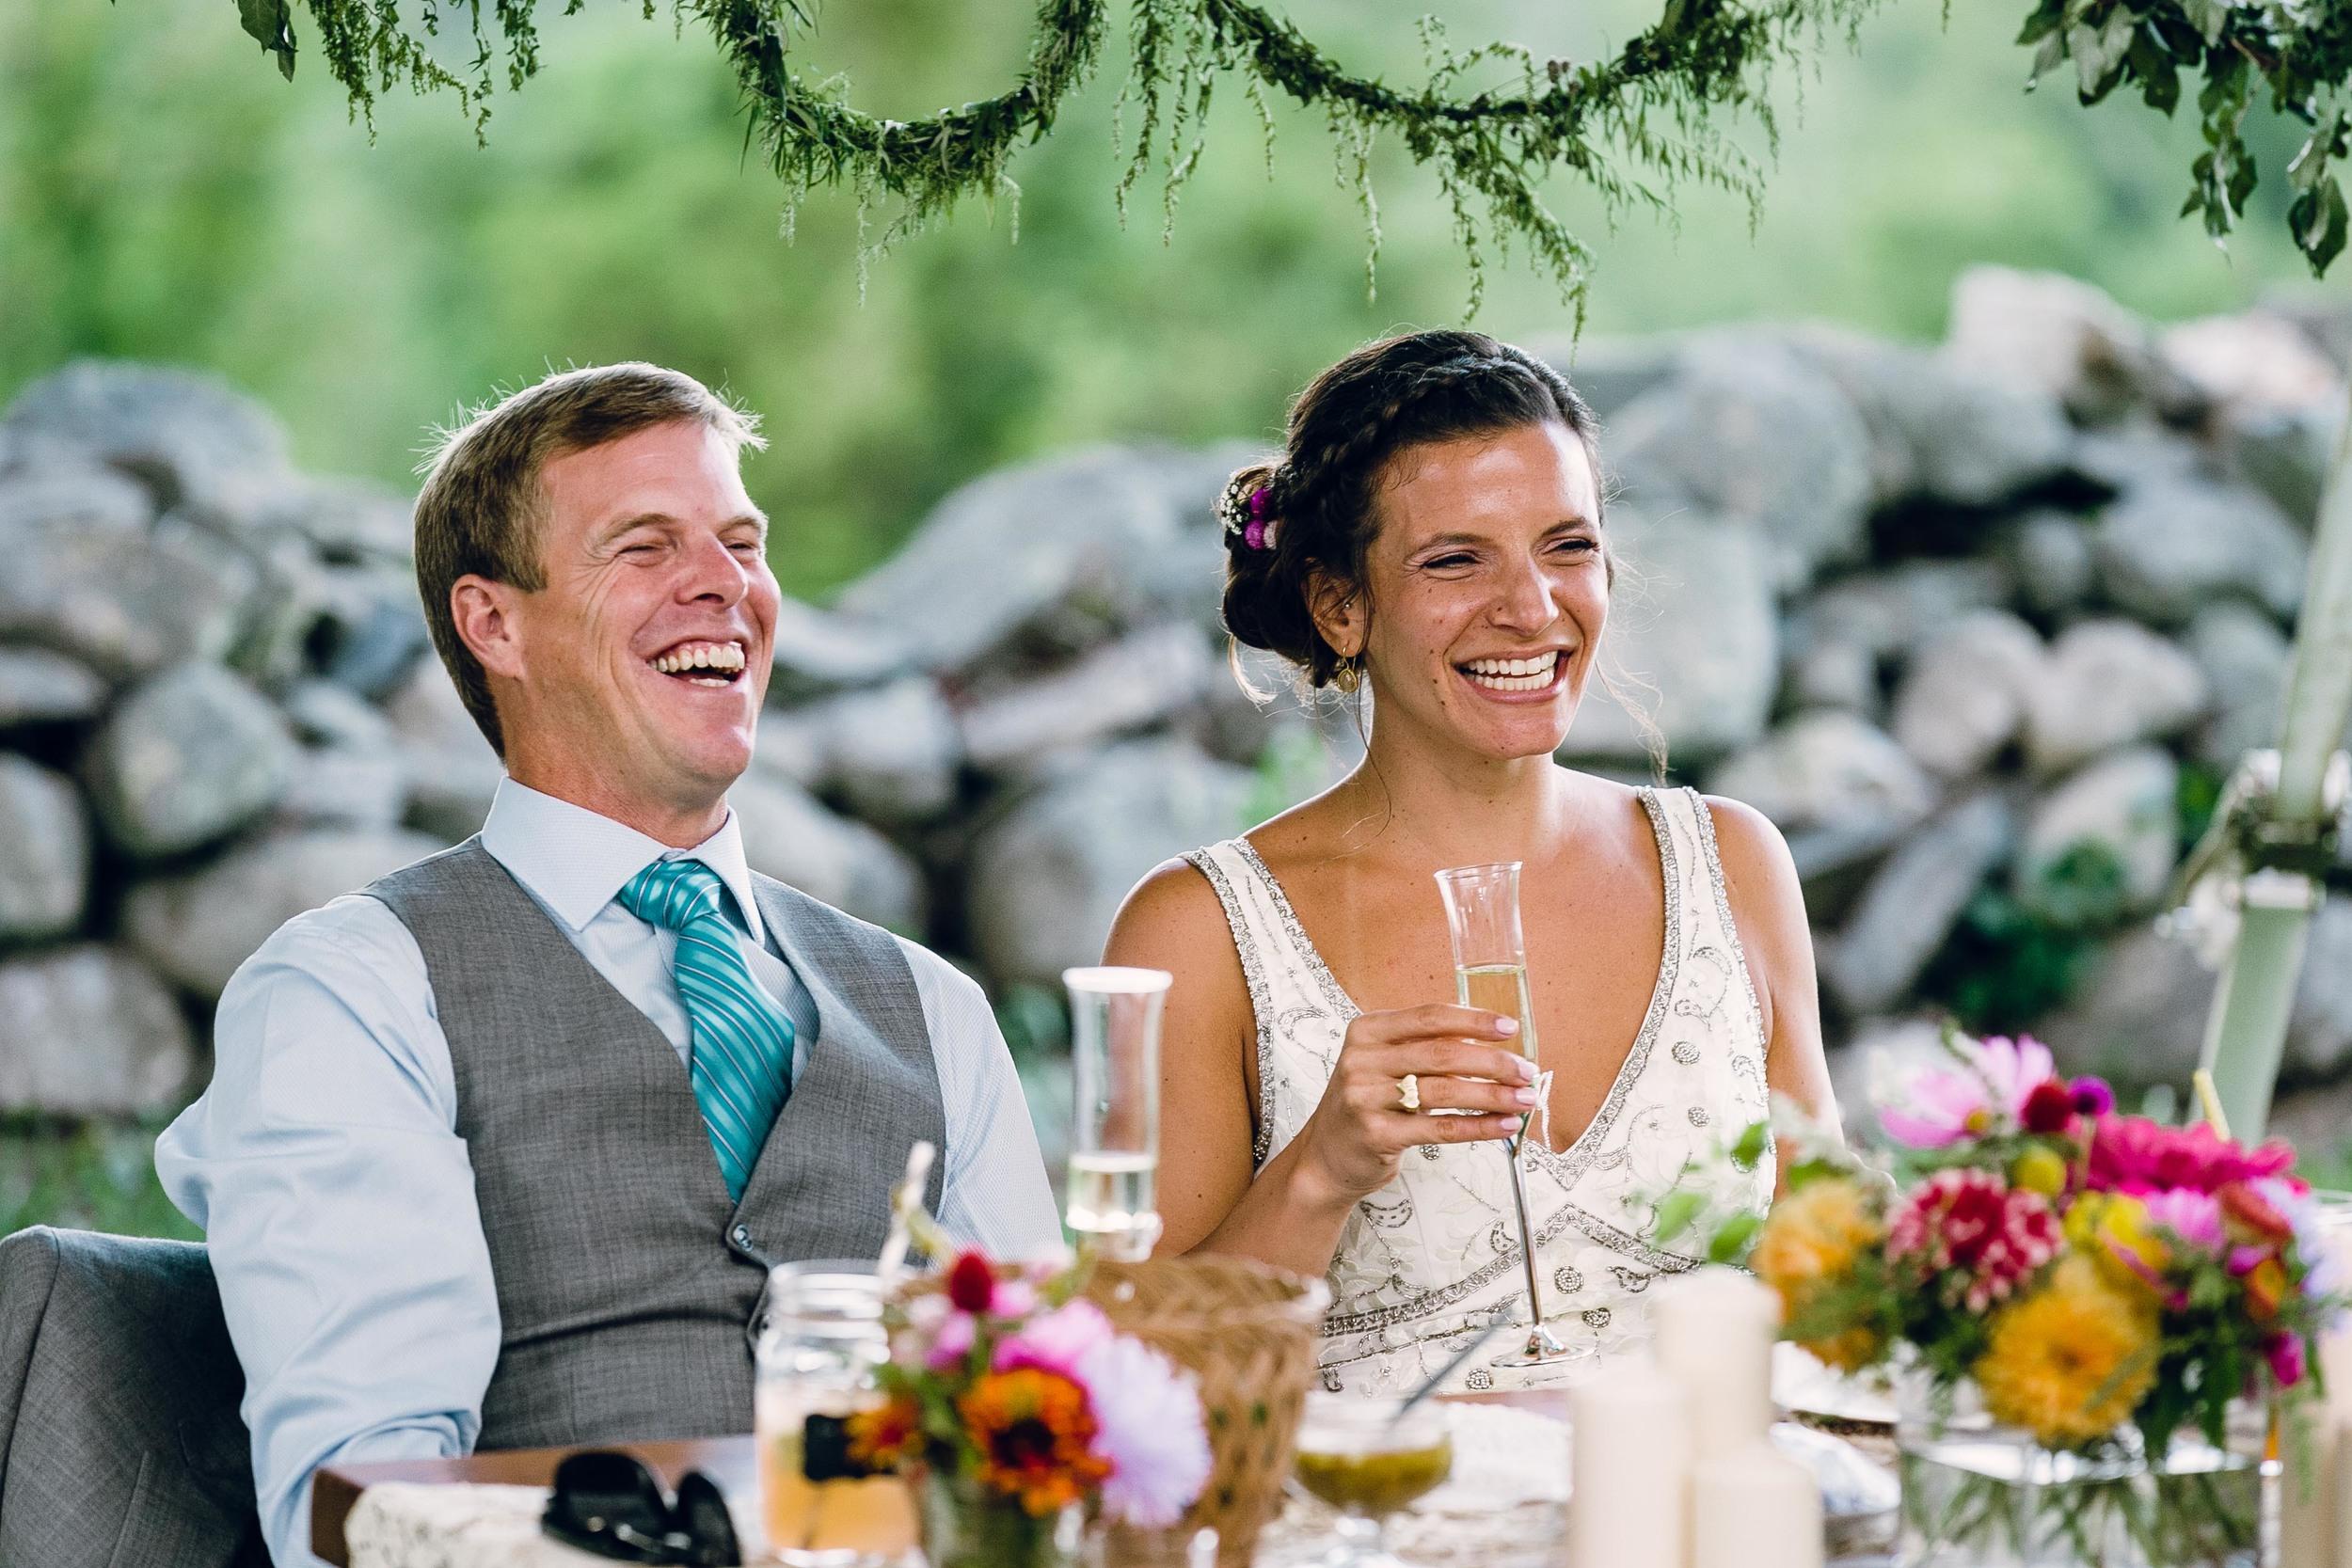 Rustic-Country-Style-Wedding-Connecticut-Farm-Photojornalistic-Wedding-Photography-by-Jacek-Dolata-13.jpg